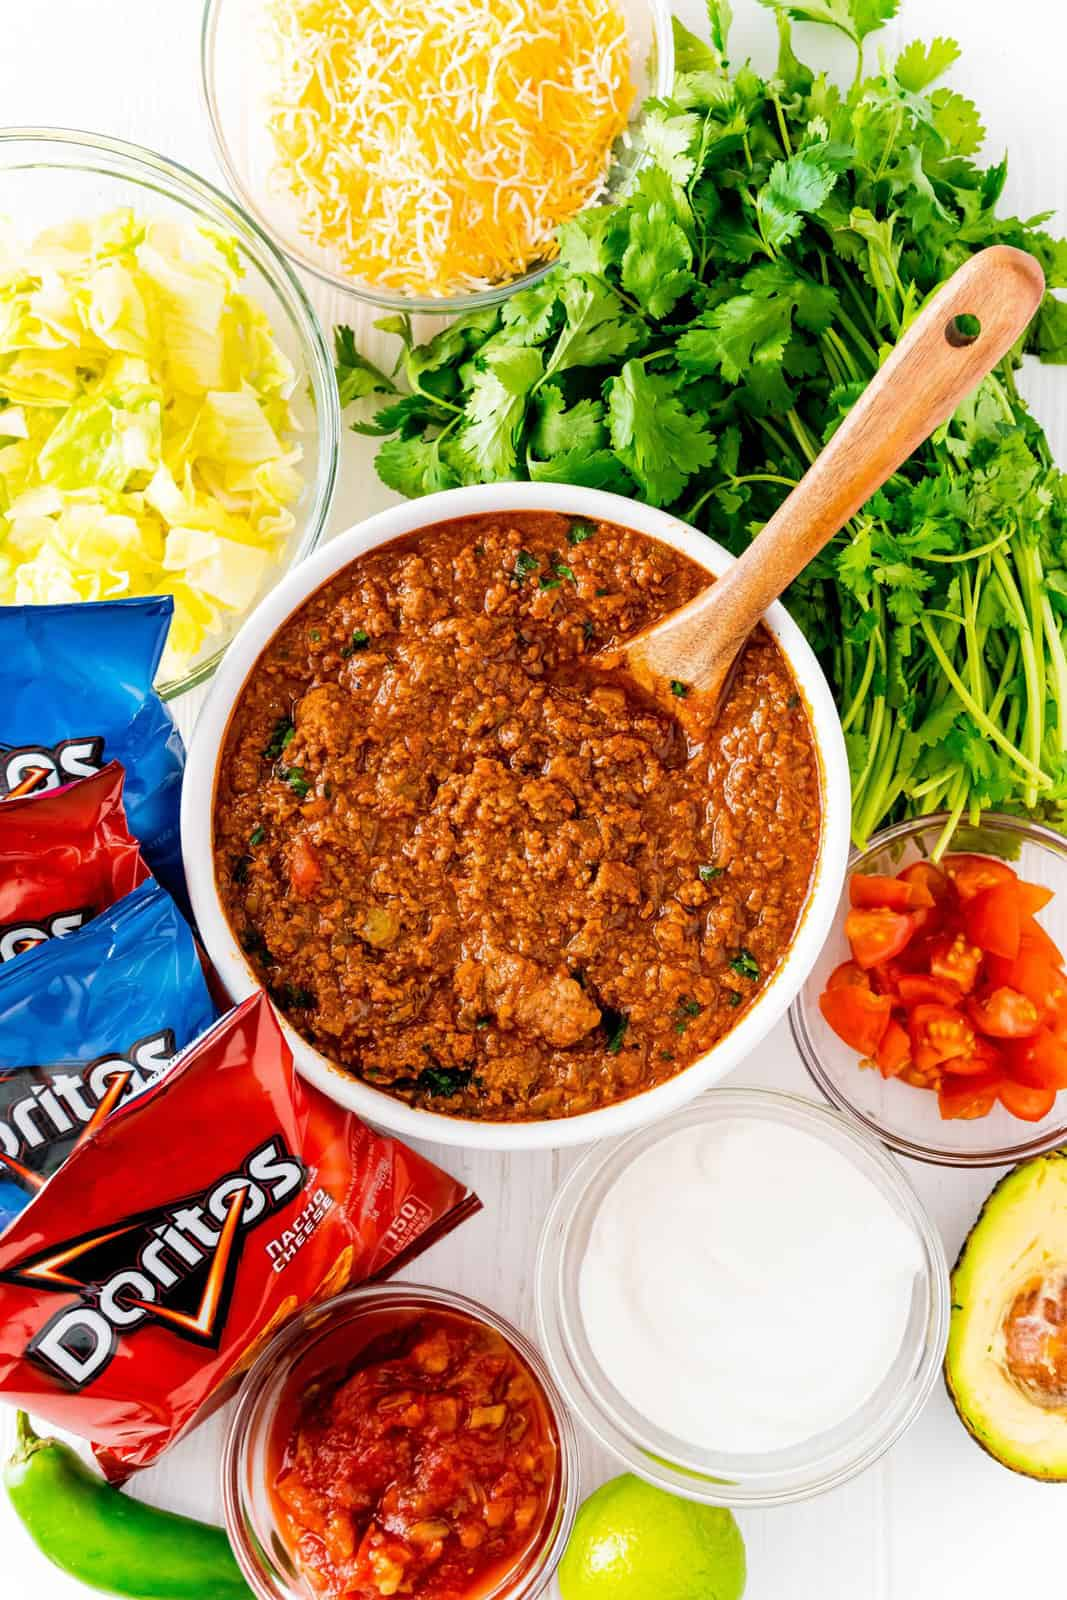 Ingredients needed to make Walking Tacos